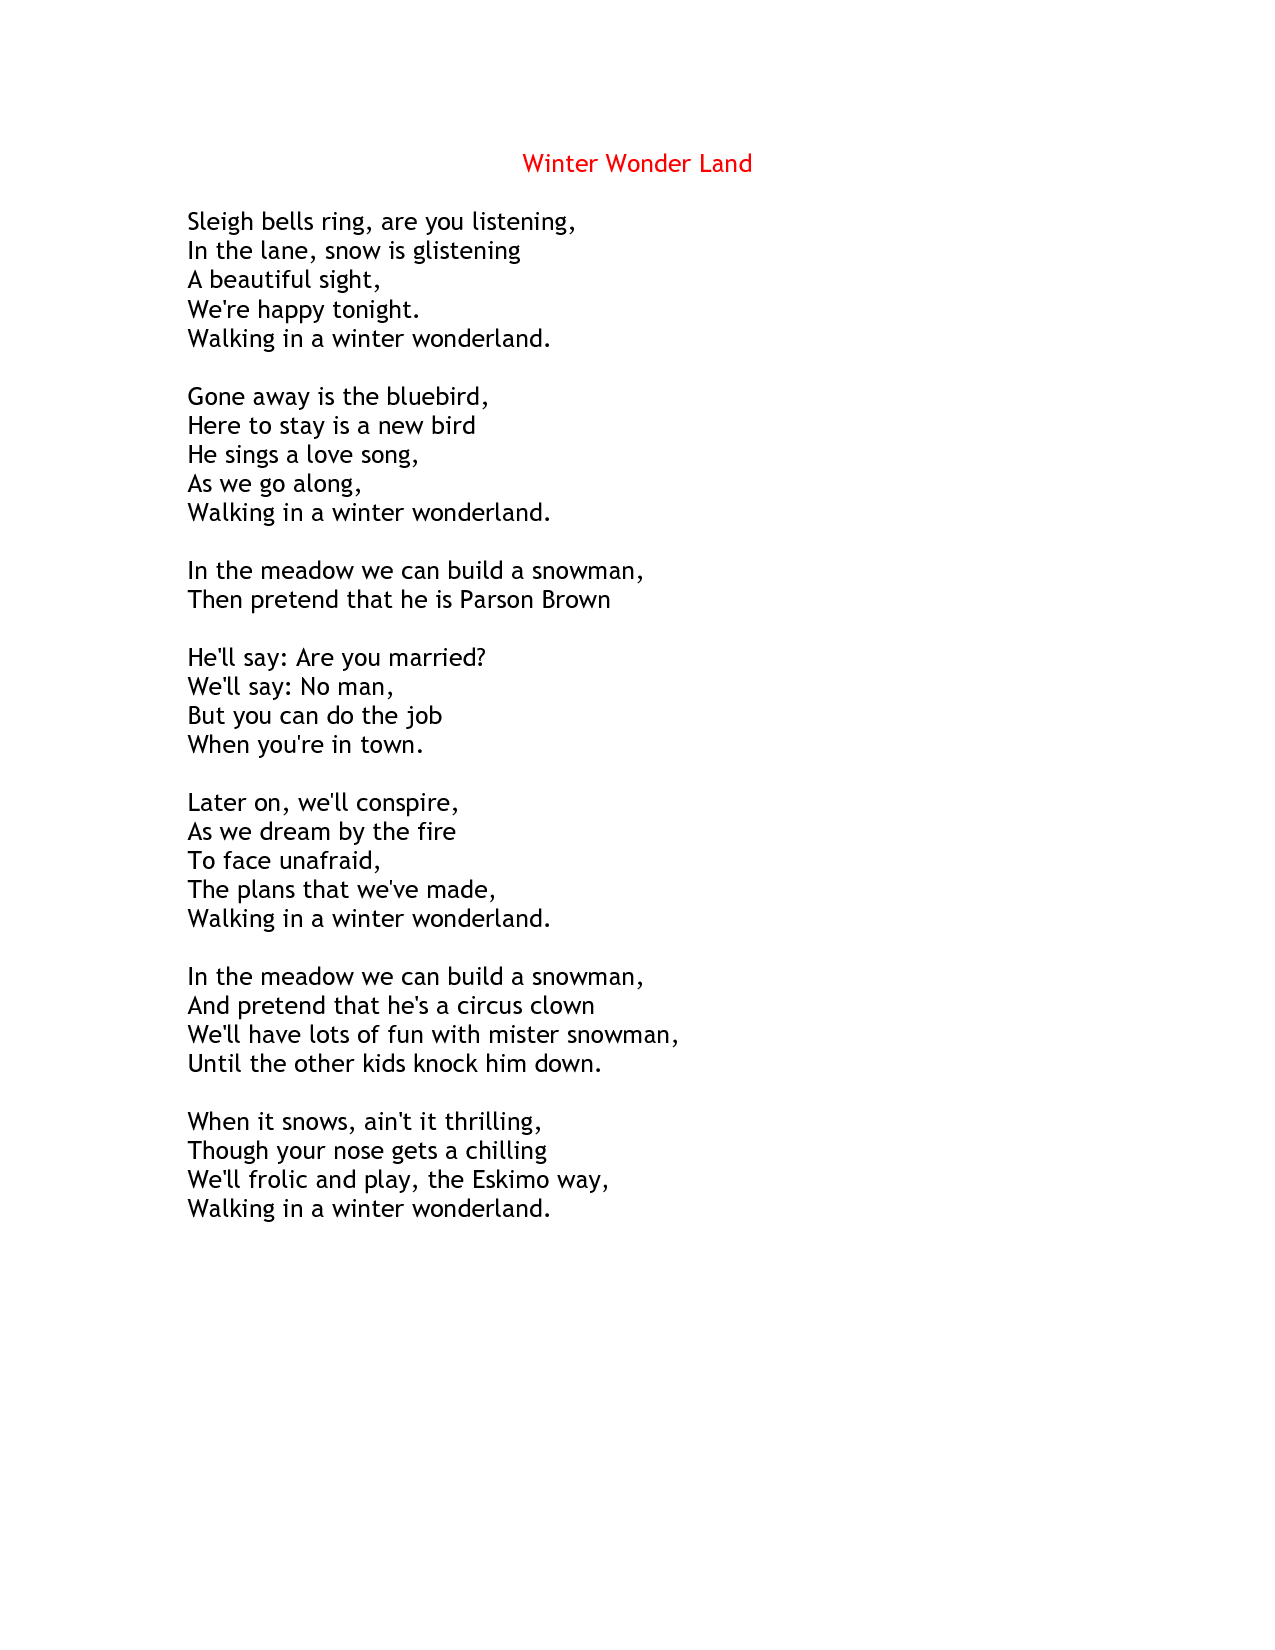 Winter Song Lyrics